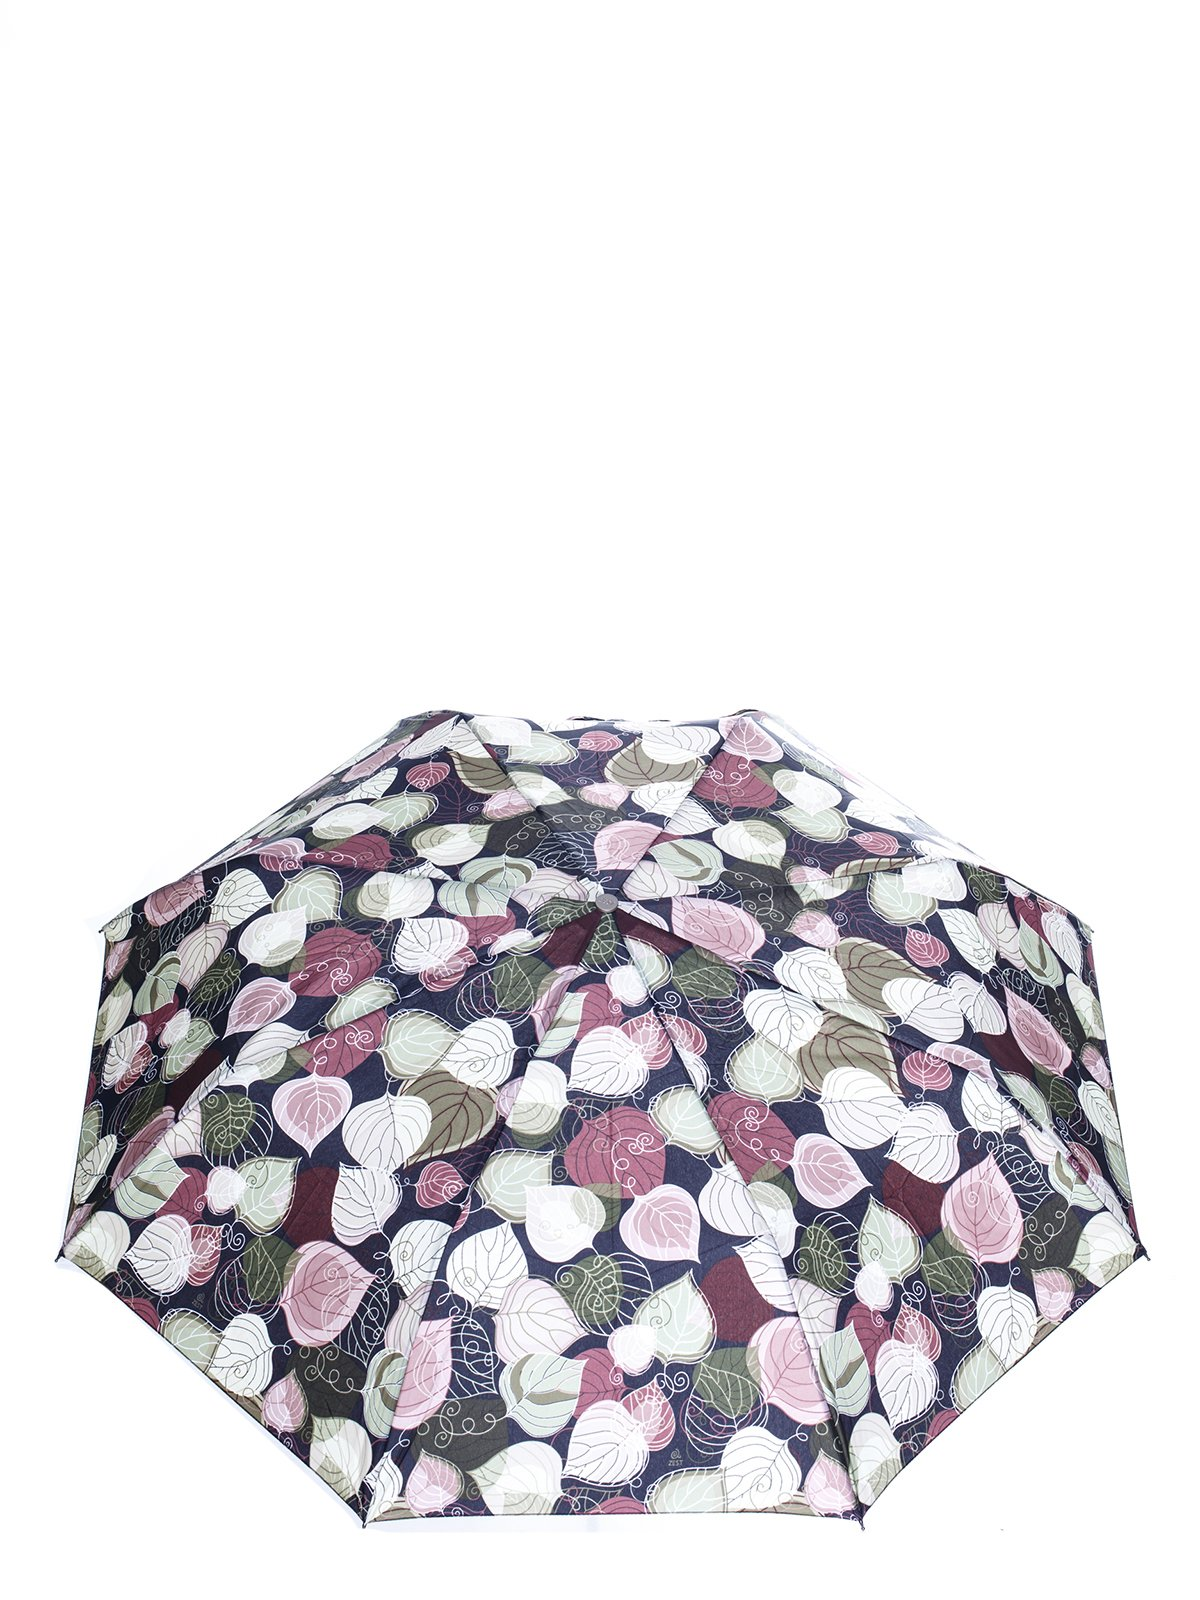 Зонт-полуавтомат | 2601530